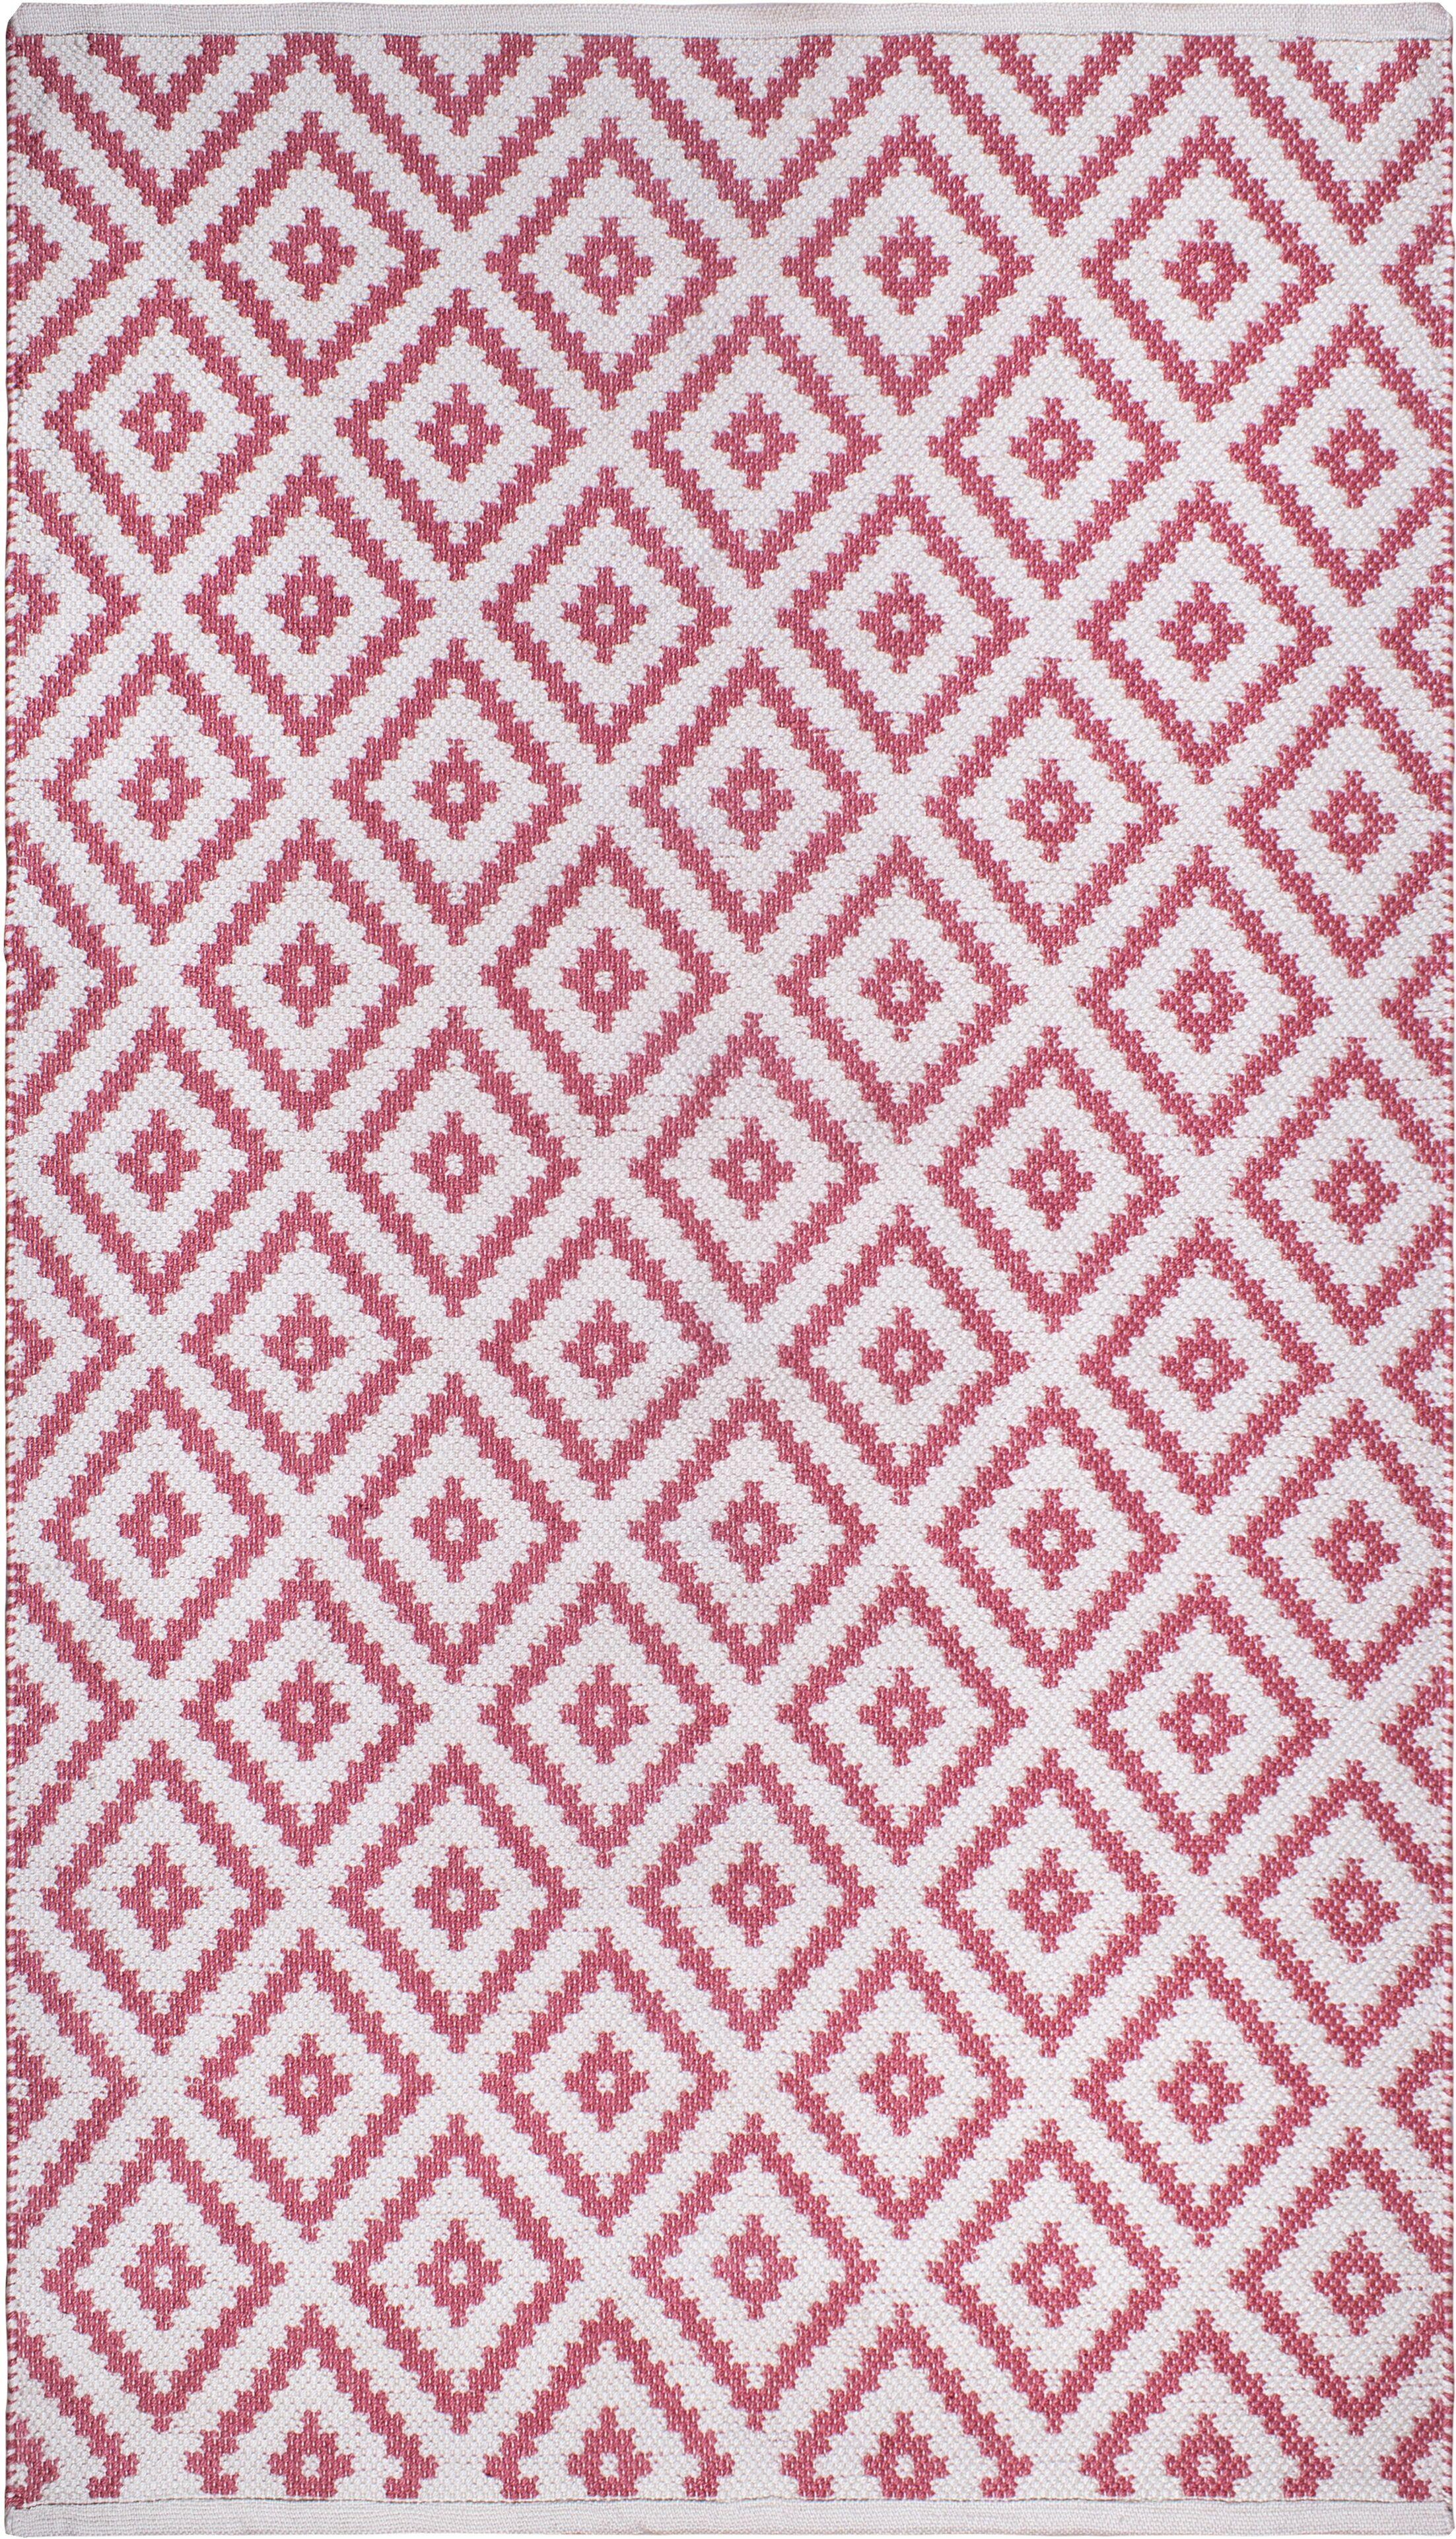 Huddleston Pink/Beige Indoor/Outdoor Area Rug Rug Size: Rectangle 8' x 10'